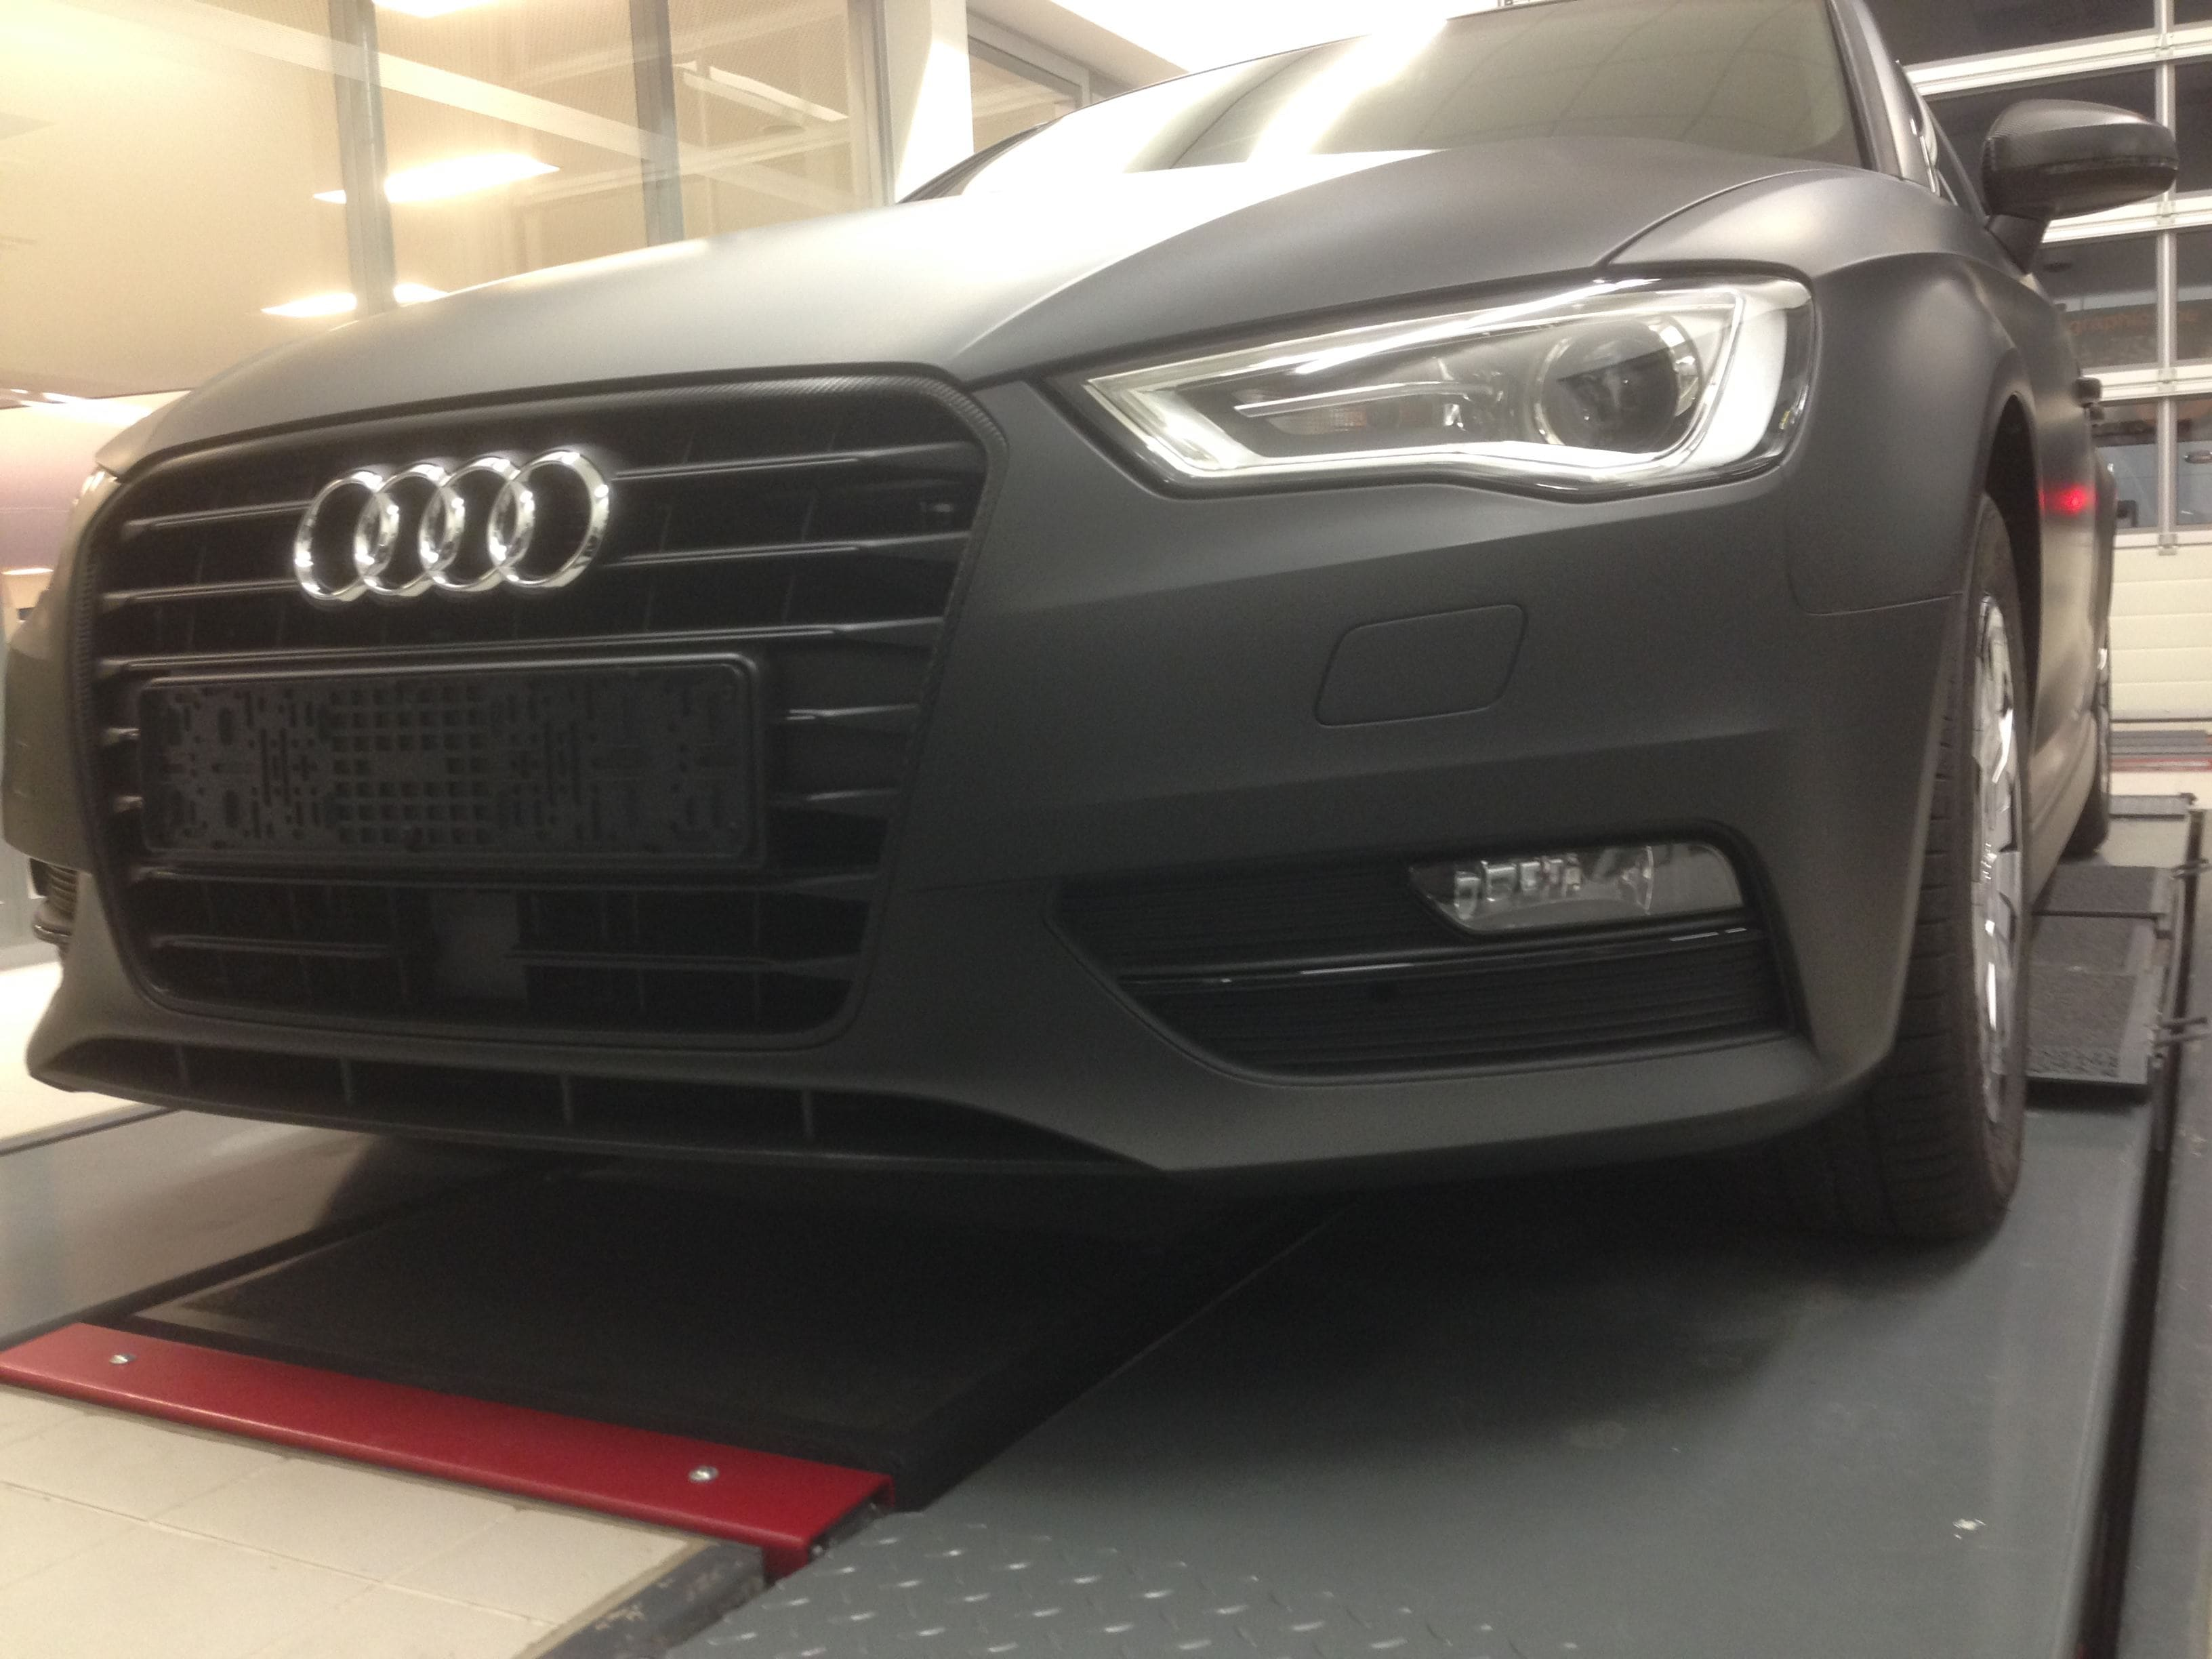 Audi A3 2014 met Mat Zwarte Wrap, Carwrapping door Wrapmyride.nu Foto-nr:4464, ©2021